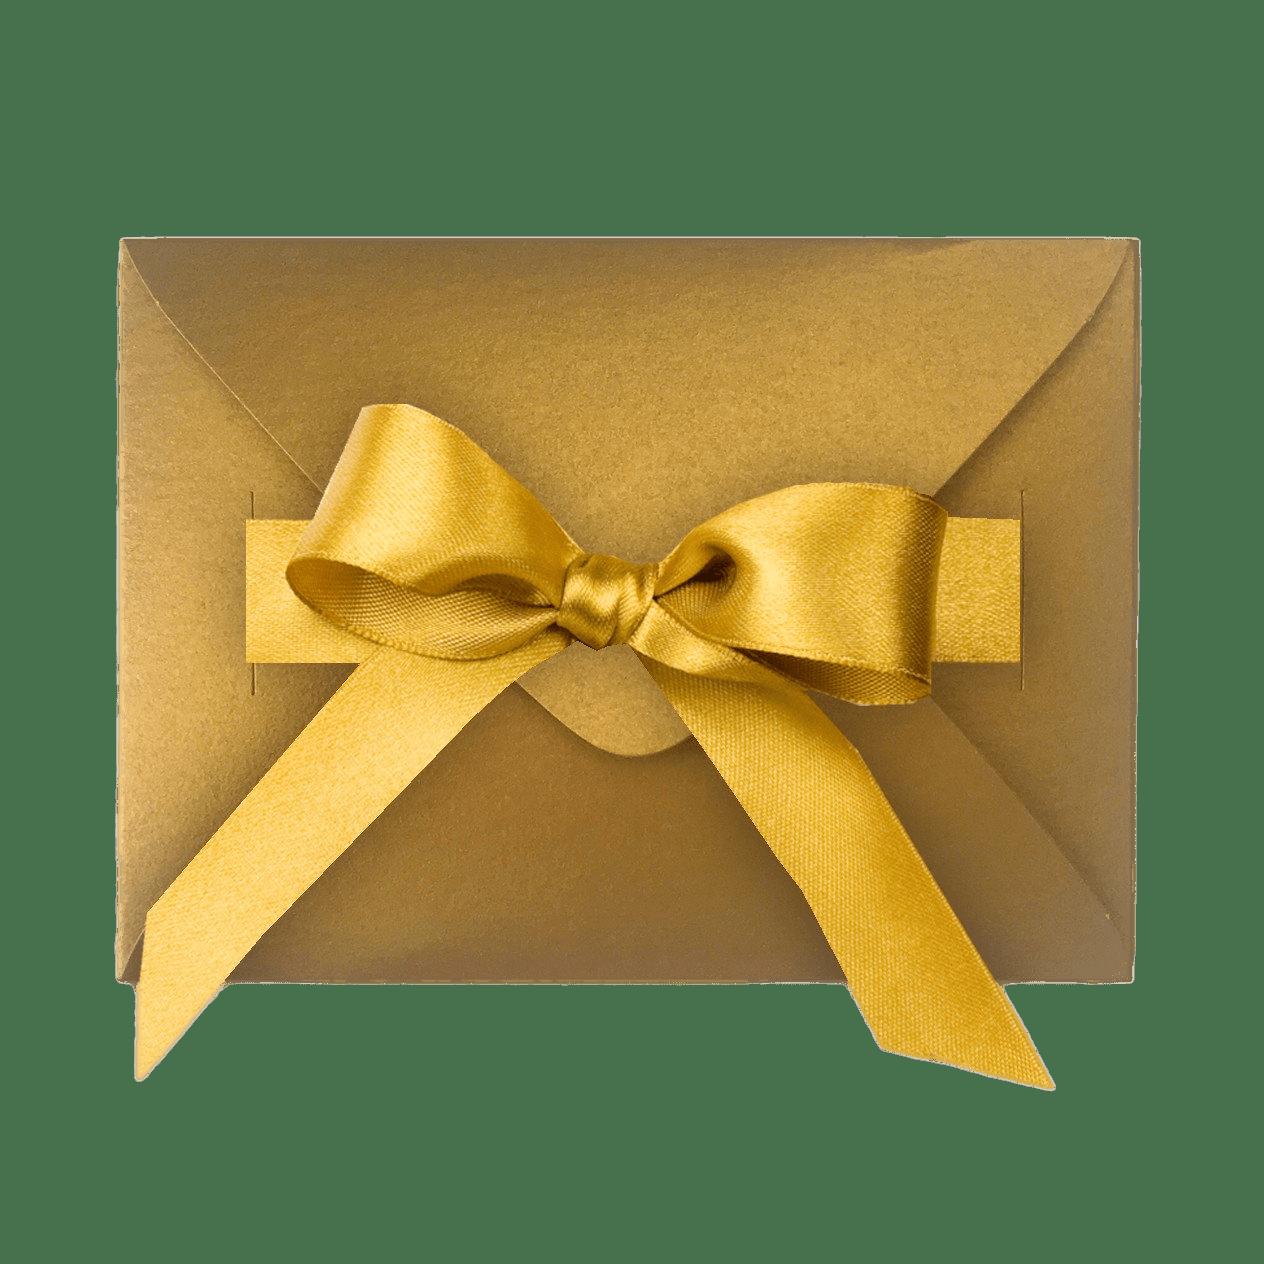 envelope clipart gold envelope